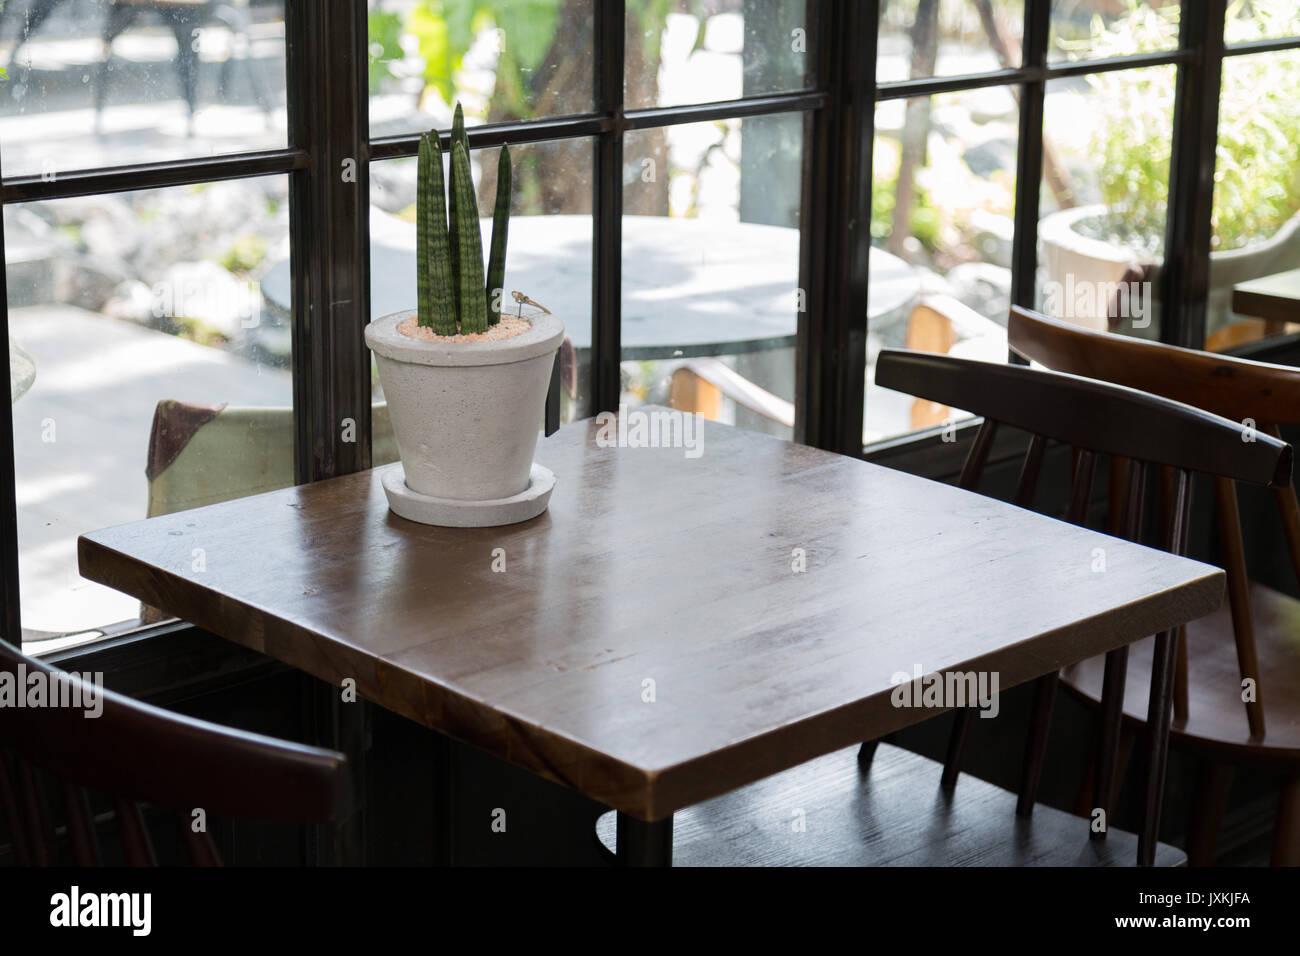 Fancy restaurant interior window stock photos fancy for Cuisine loft